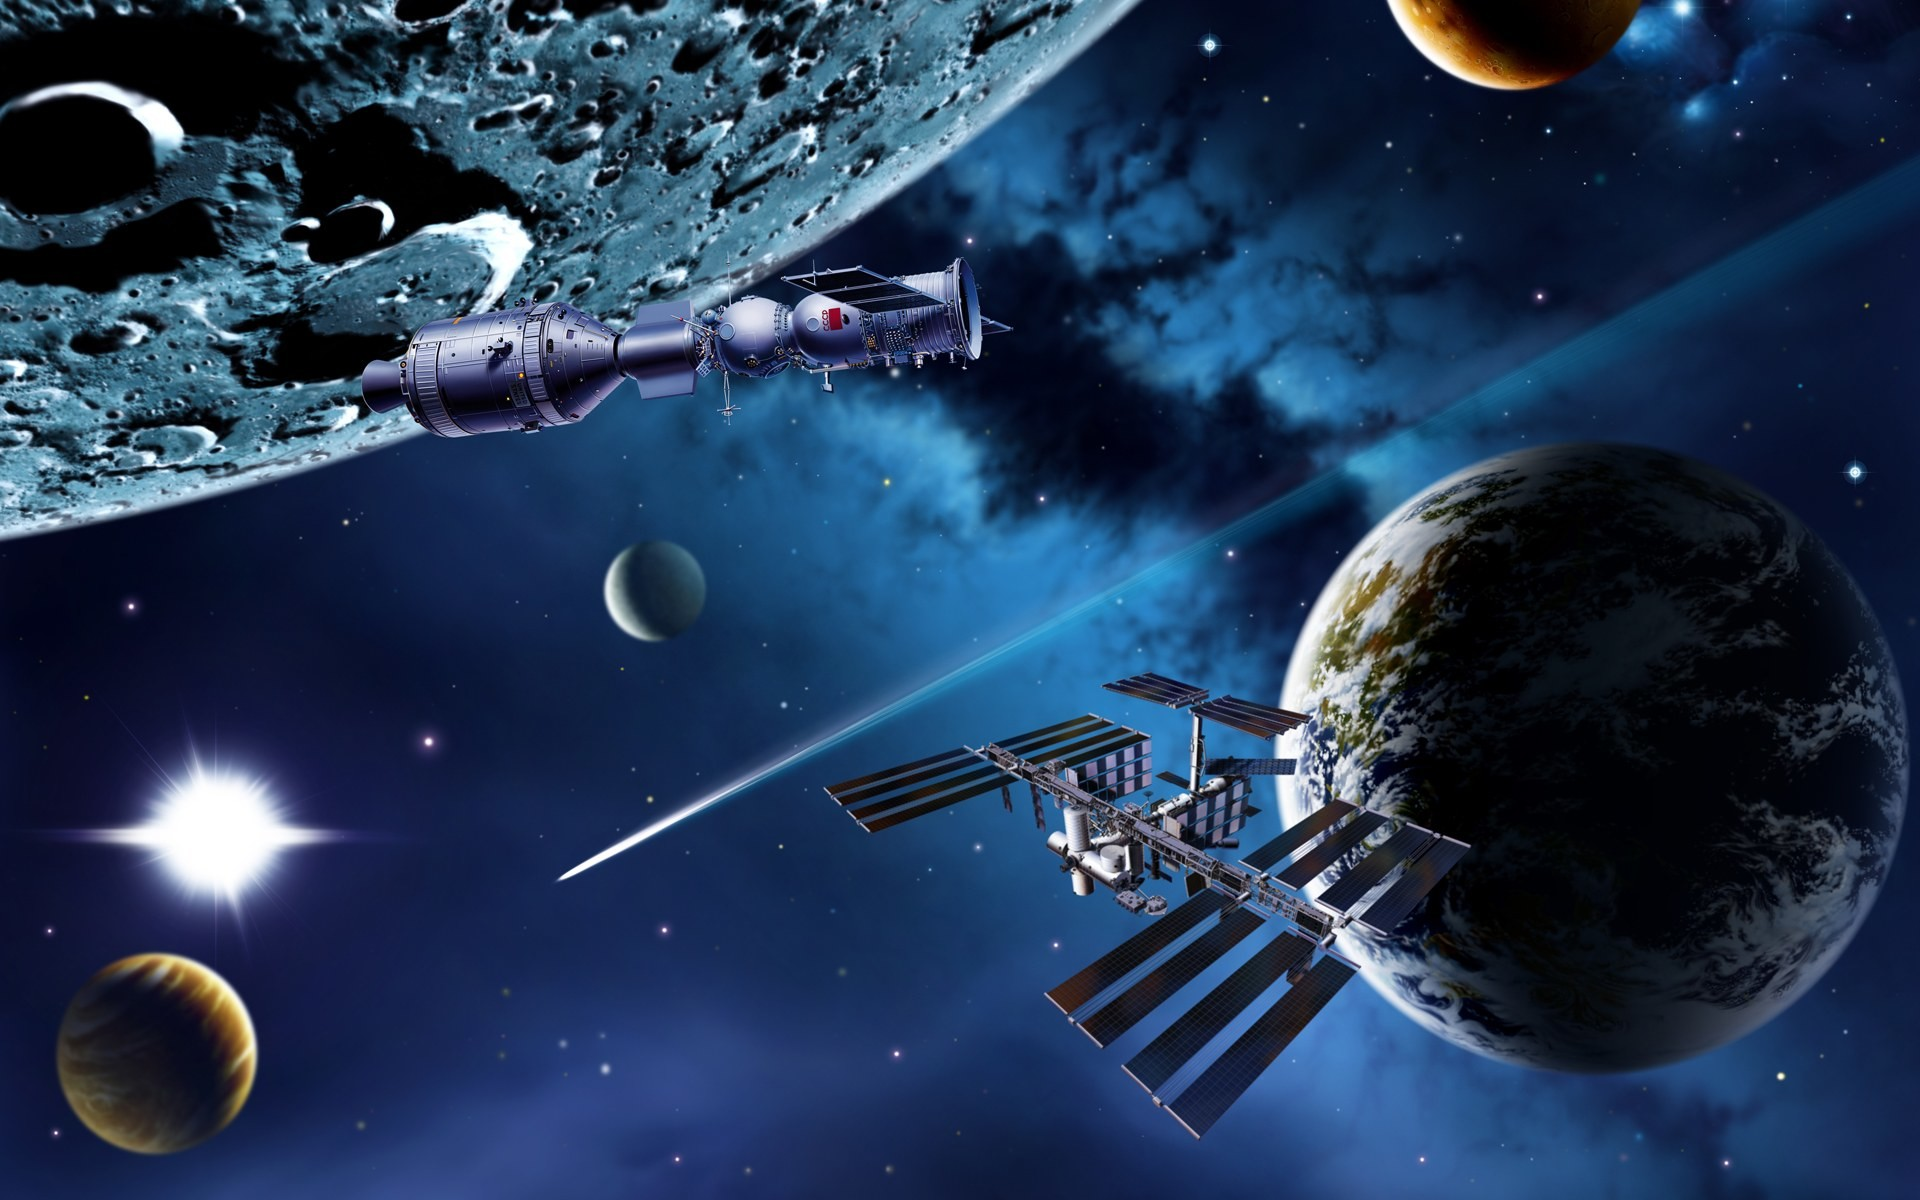 galaxy planets 1 JPG. 1920×1200197457. fantasy space art wallpaper 1024×768  img25